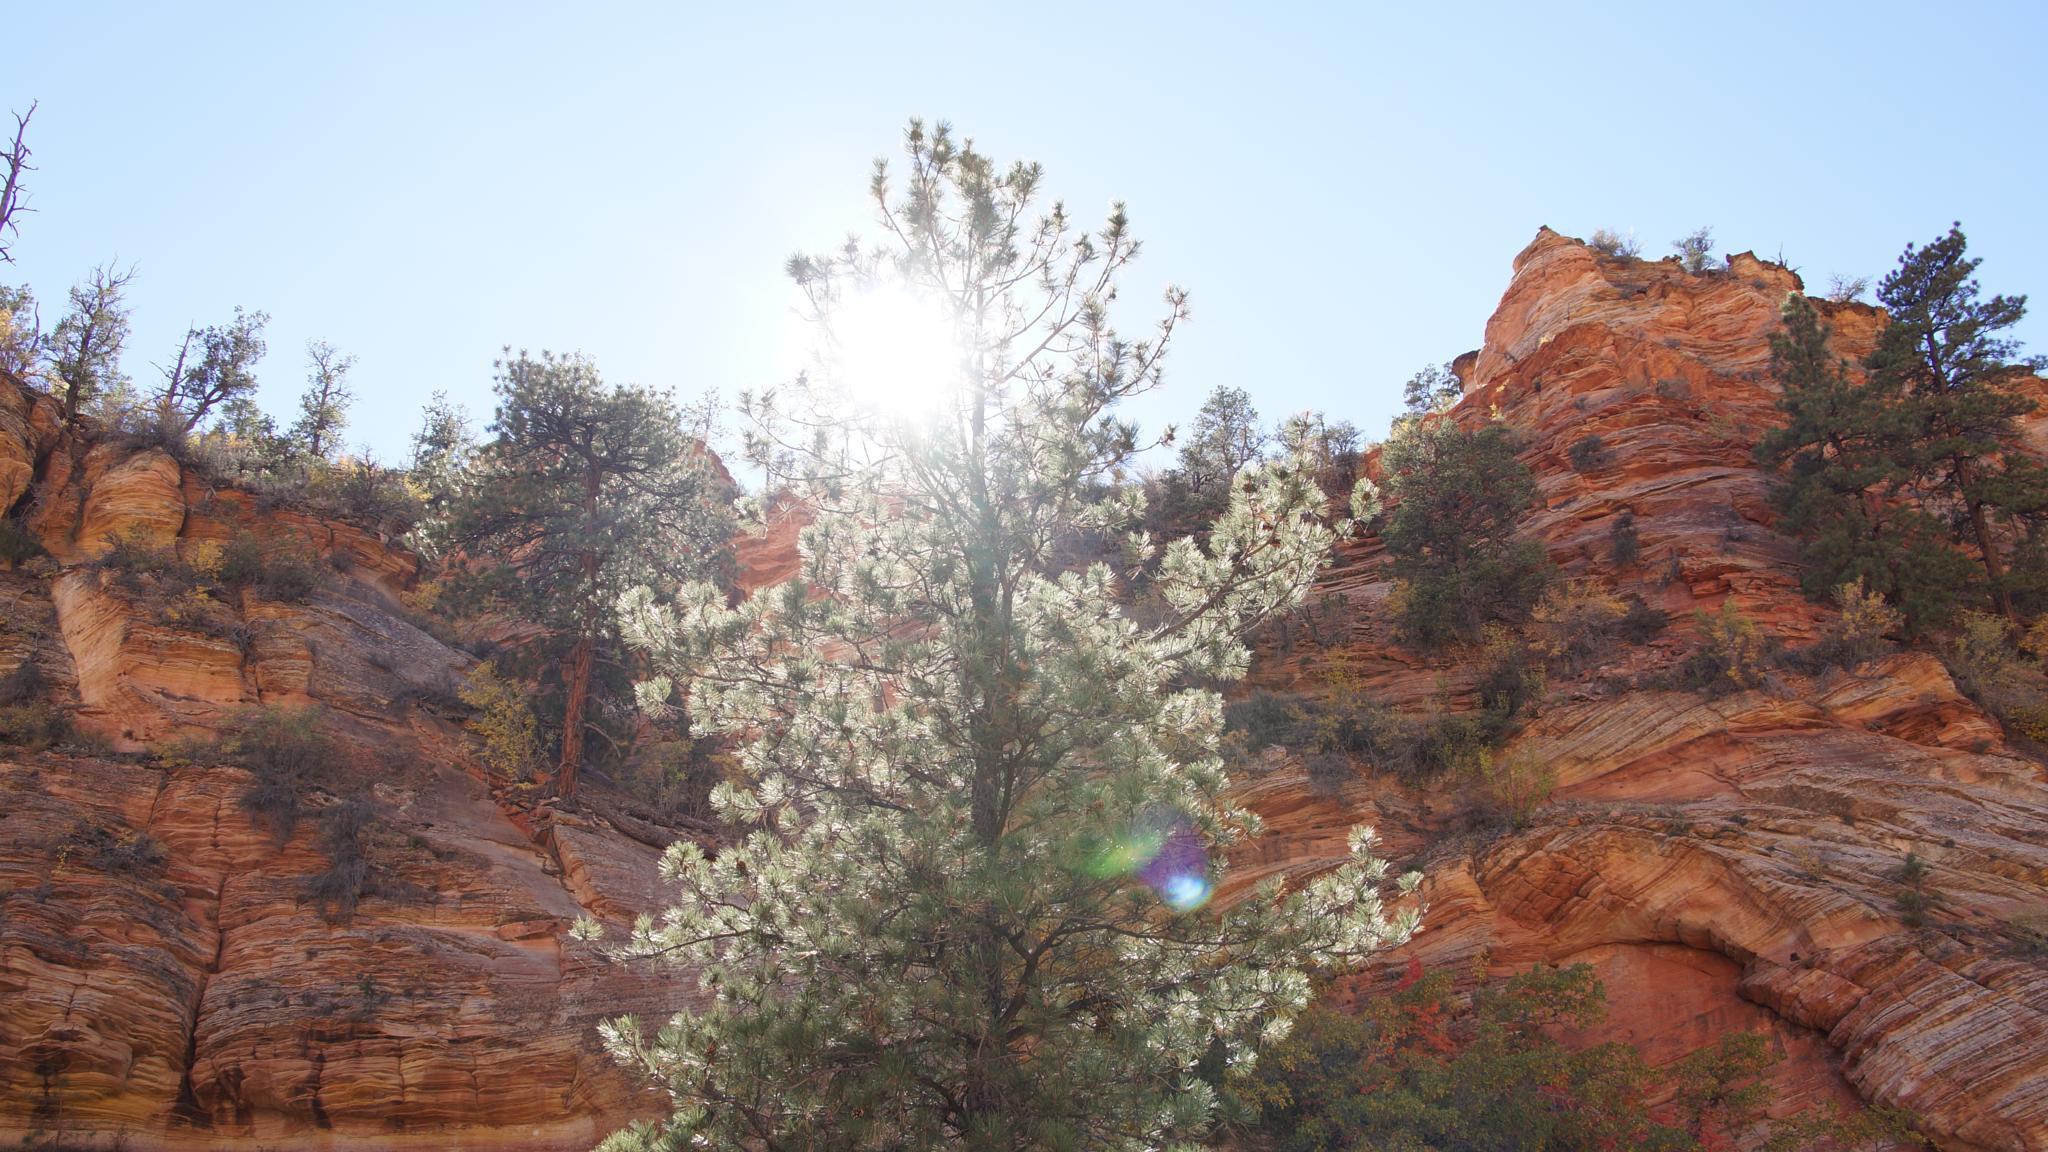 Sun through lonely tree by Sophia von Wrangell